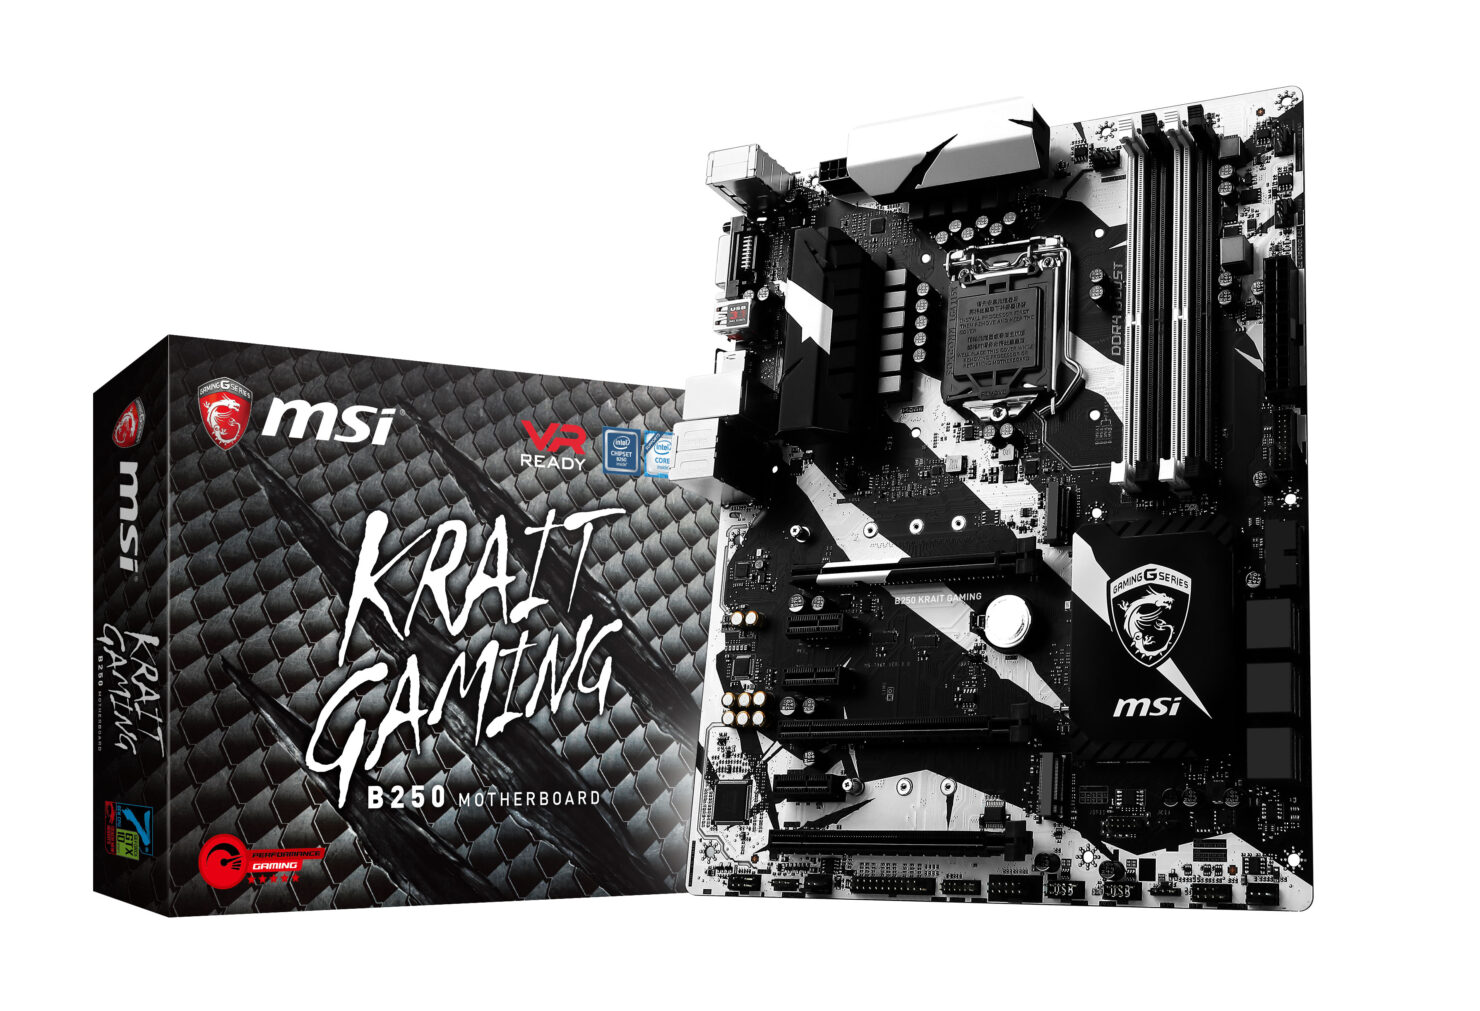 msi-b250_krait_gaming-product_pictures-boxshot